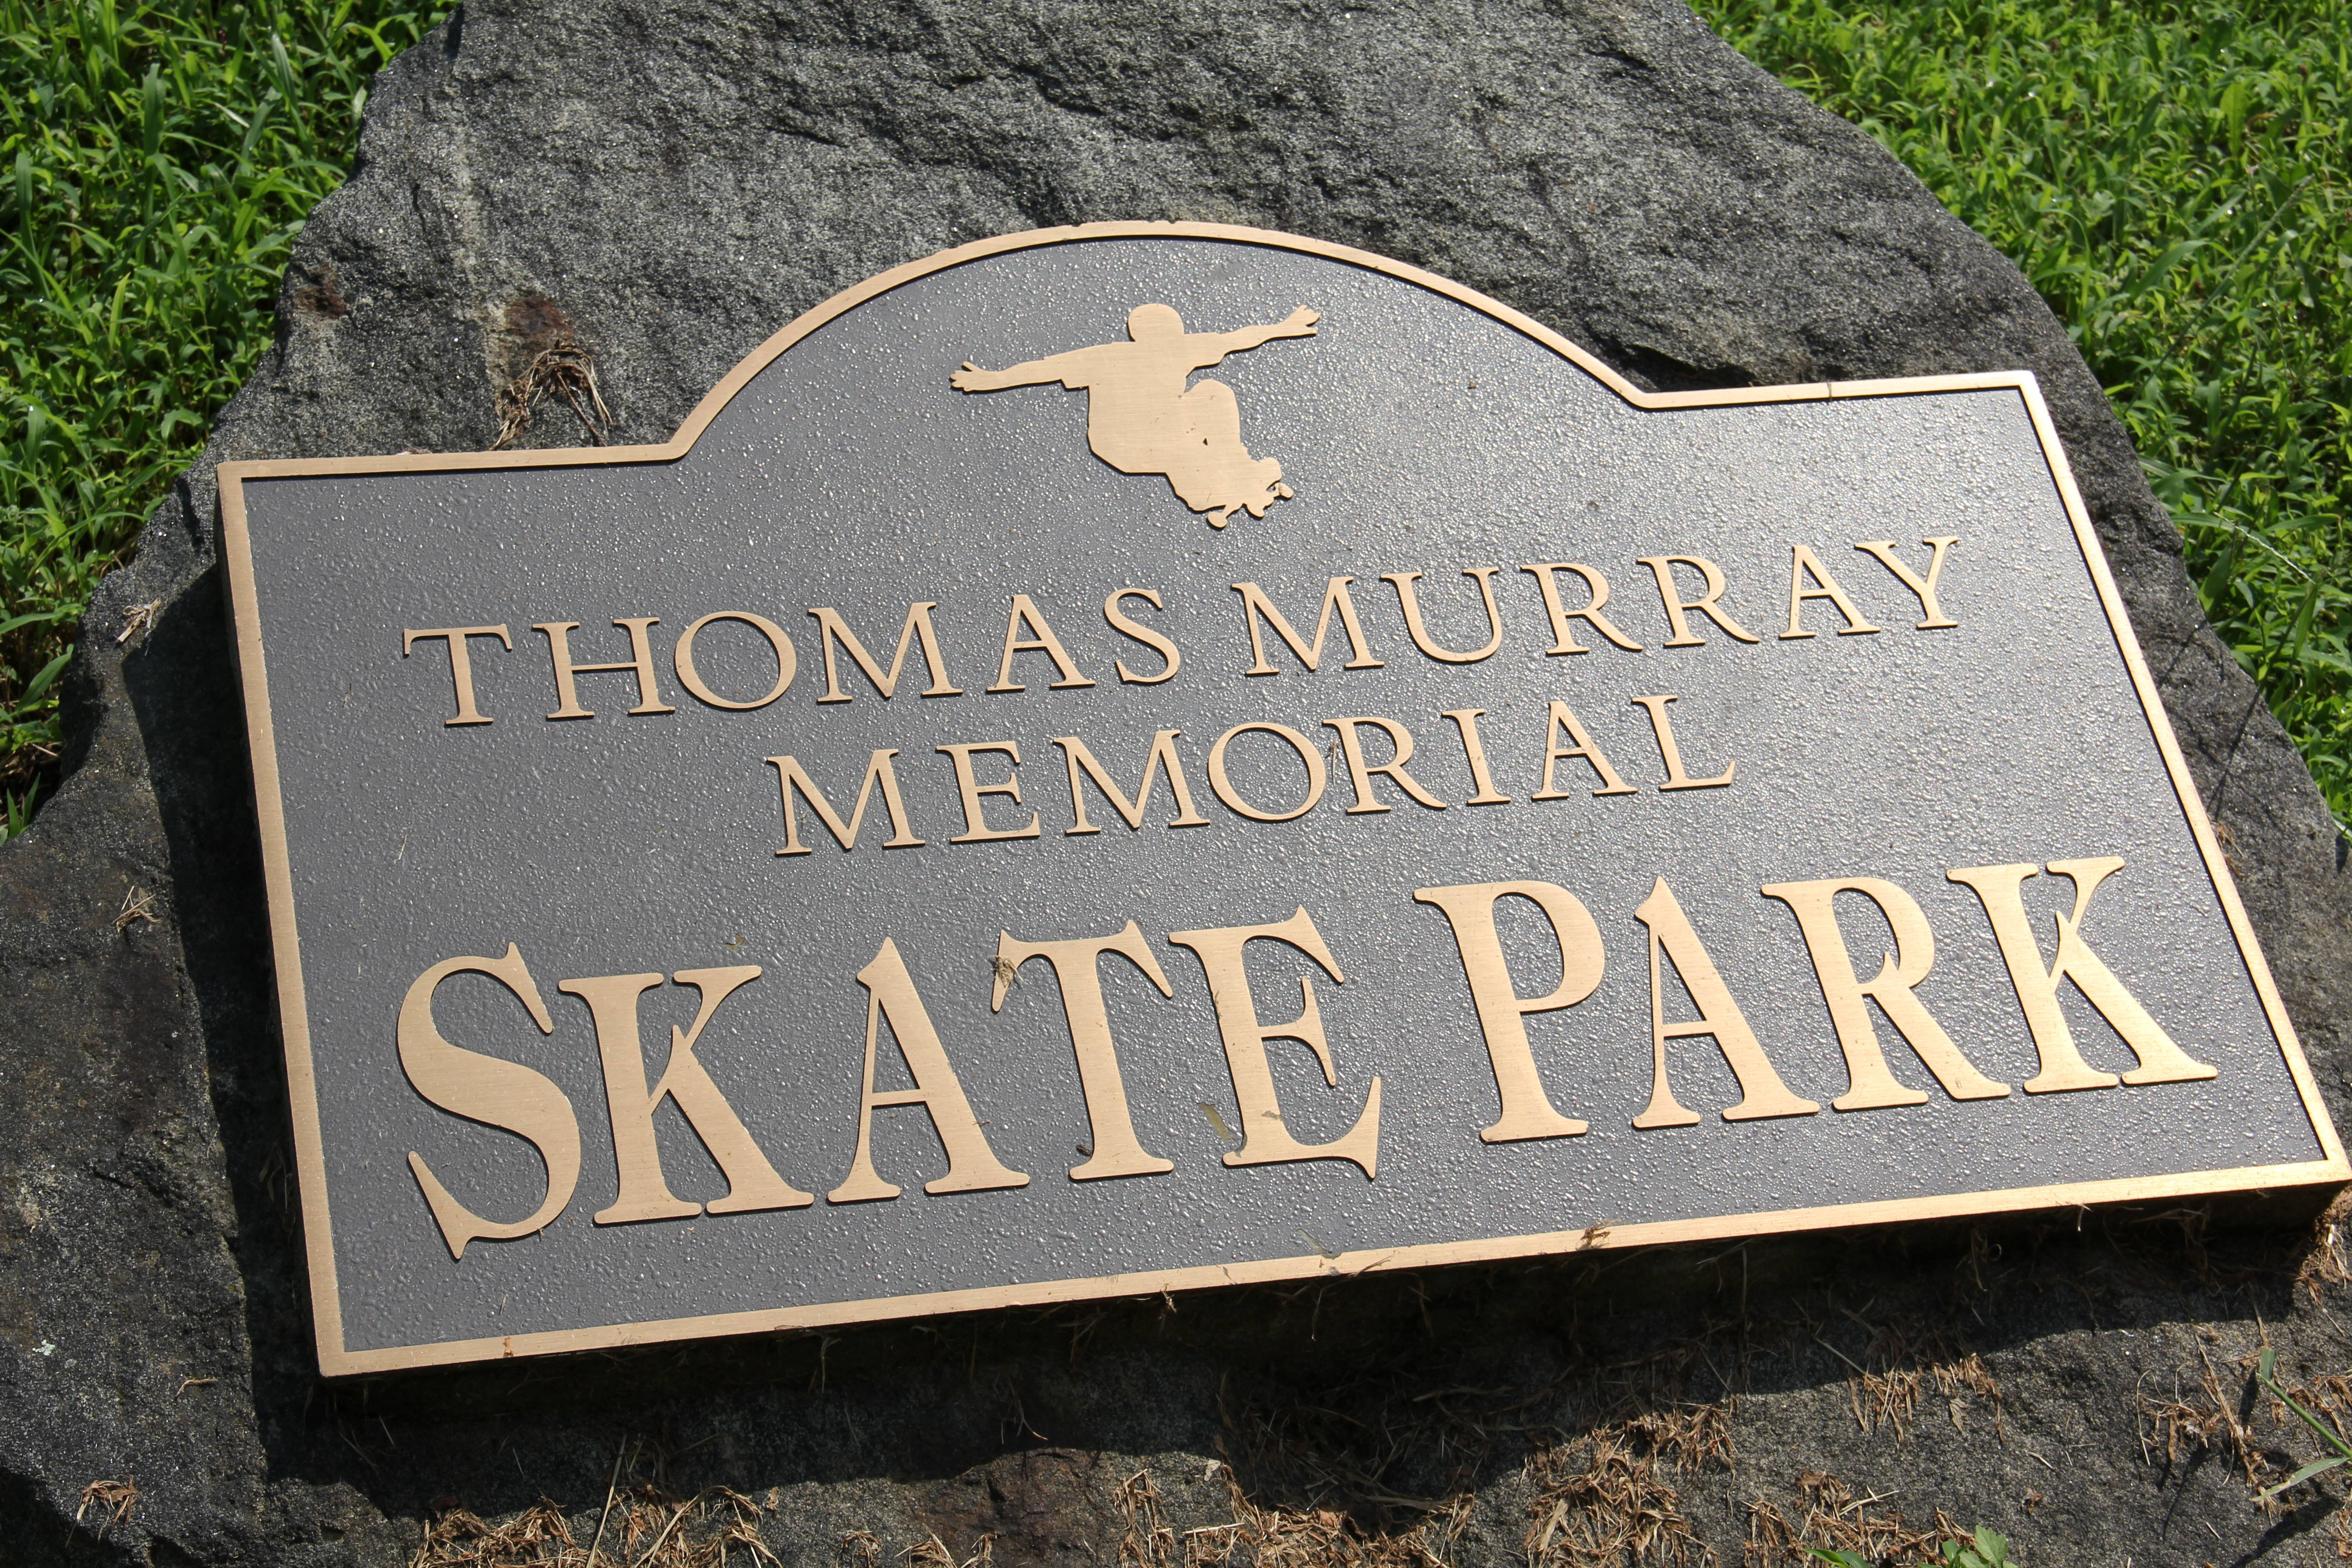 Sparta Skate Park Gets a Second Life